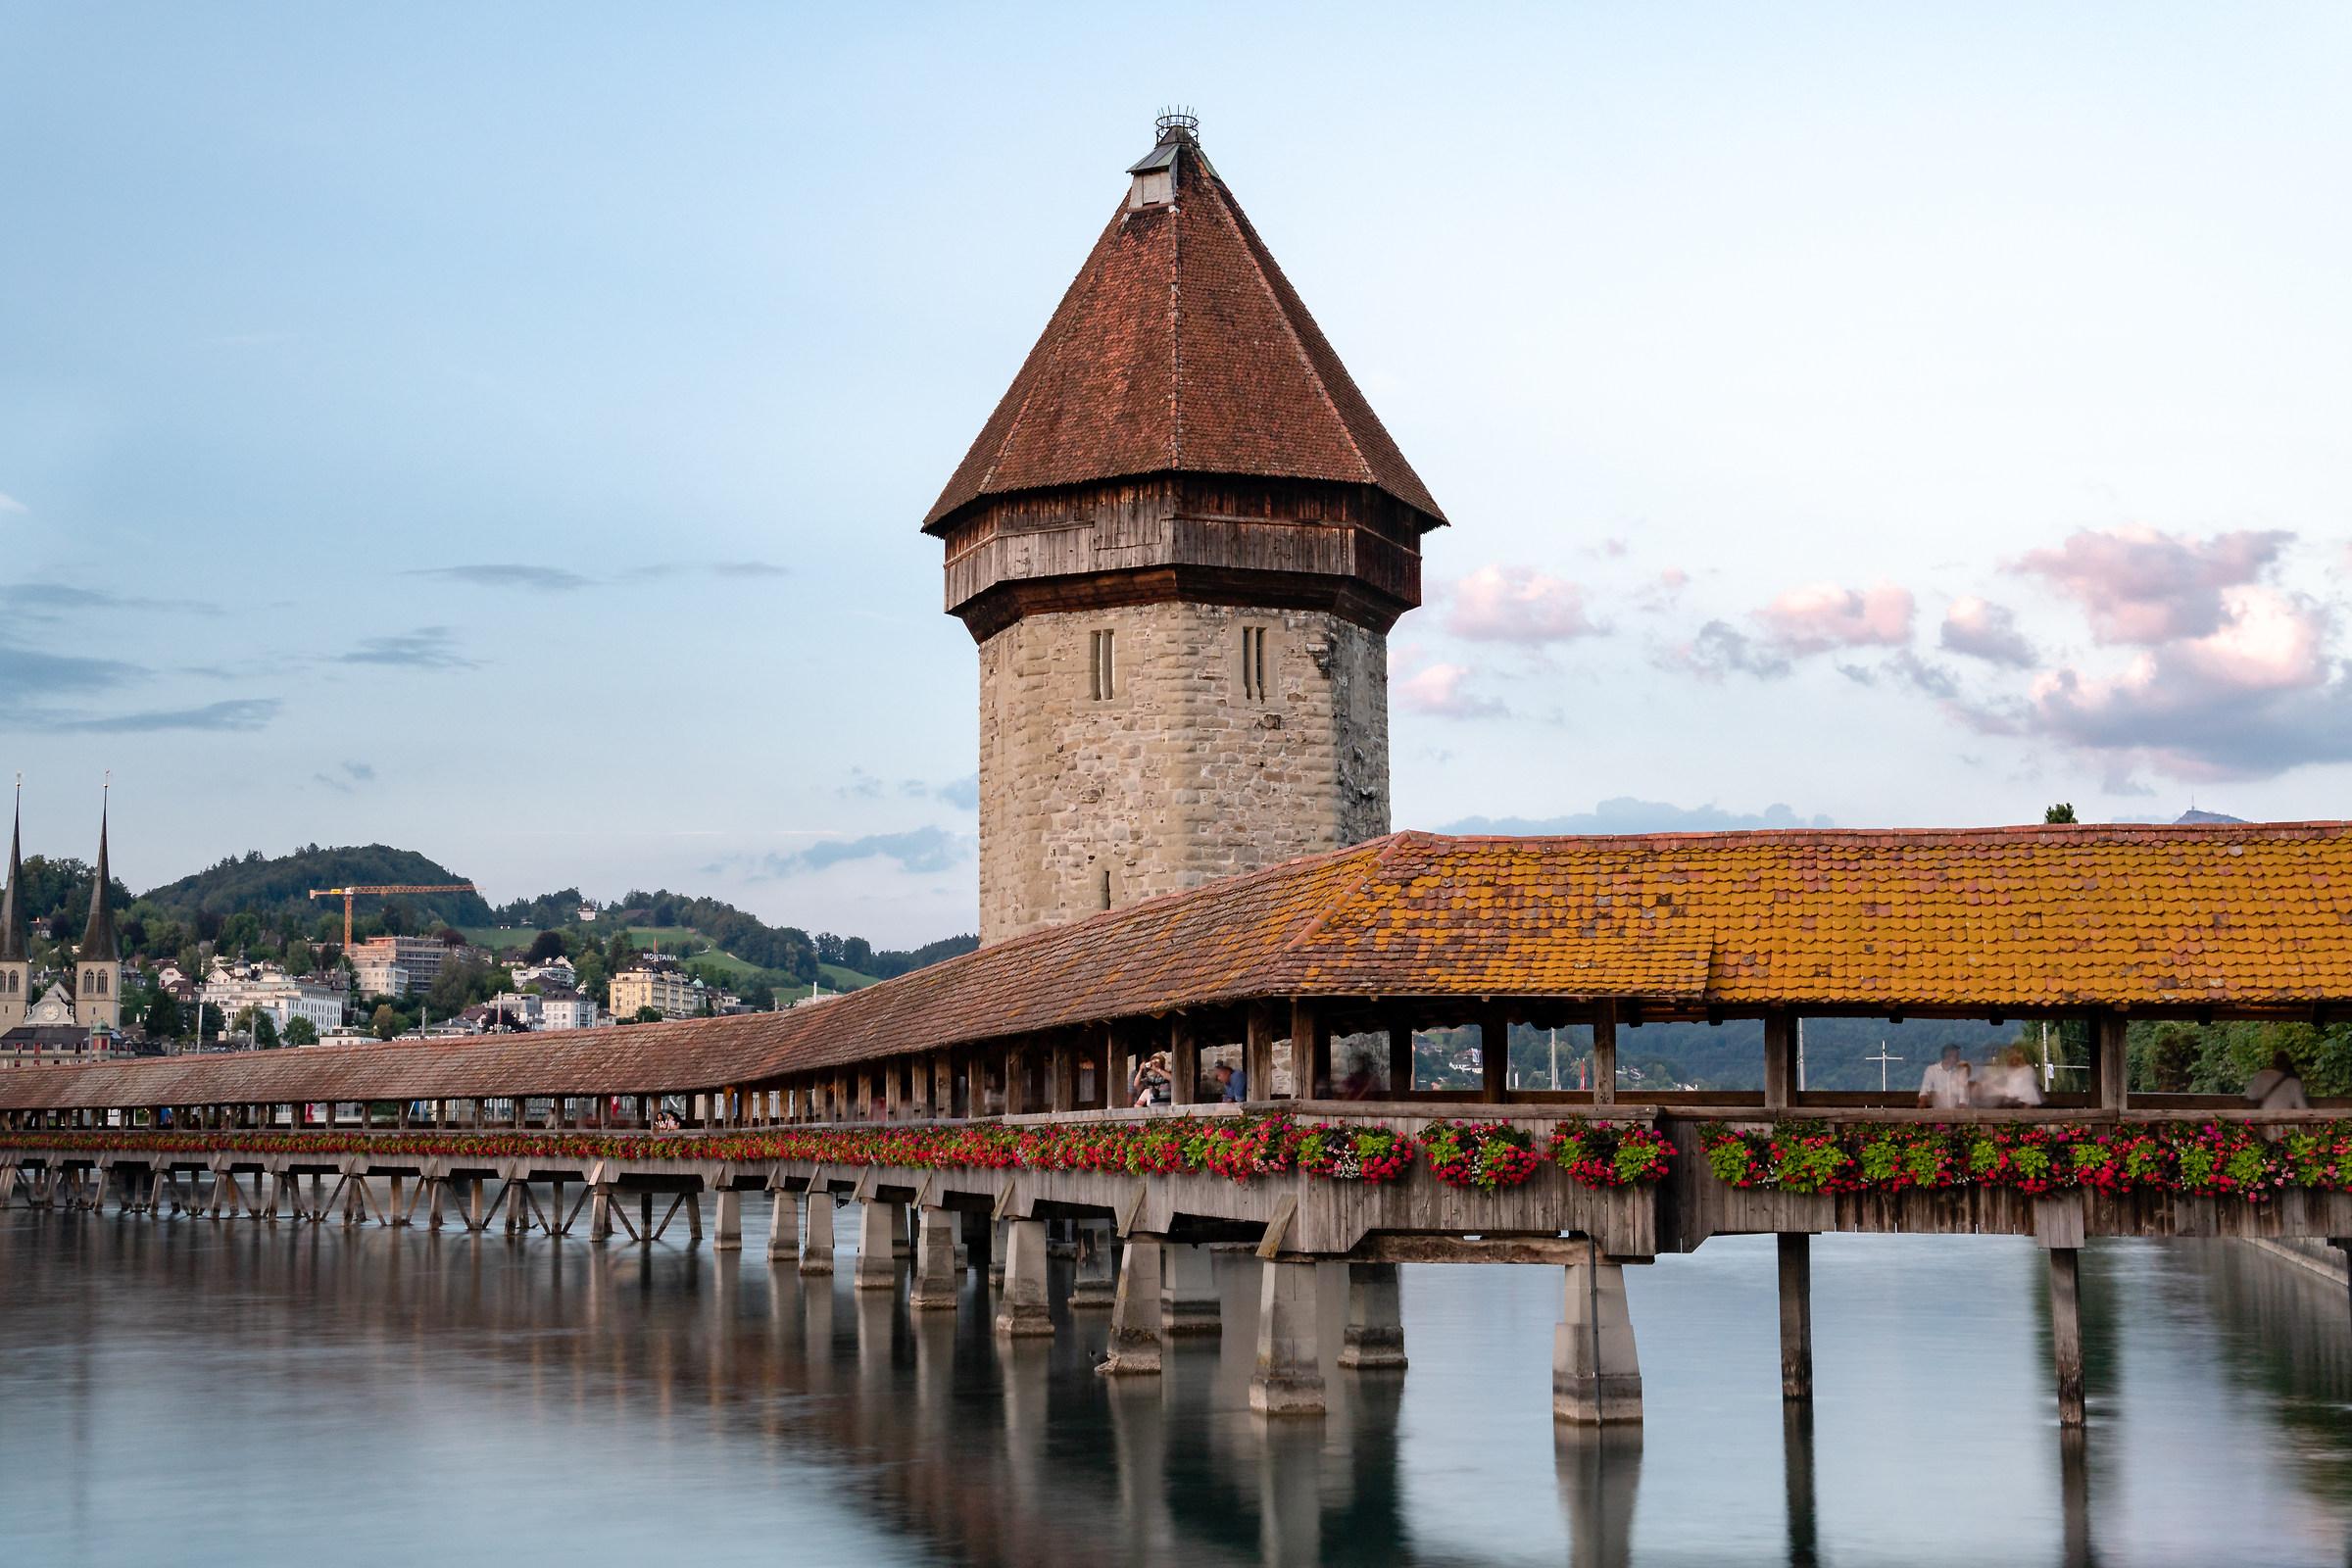 kapellbruche (Luzern)...